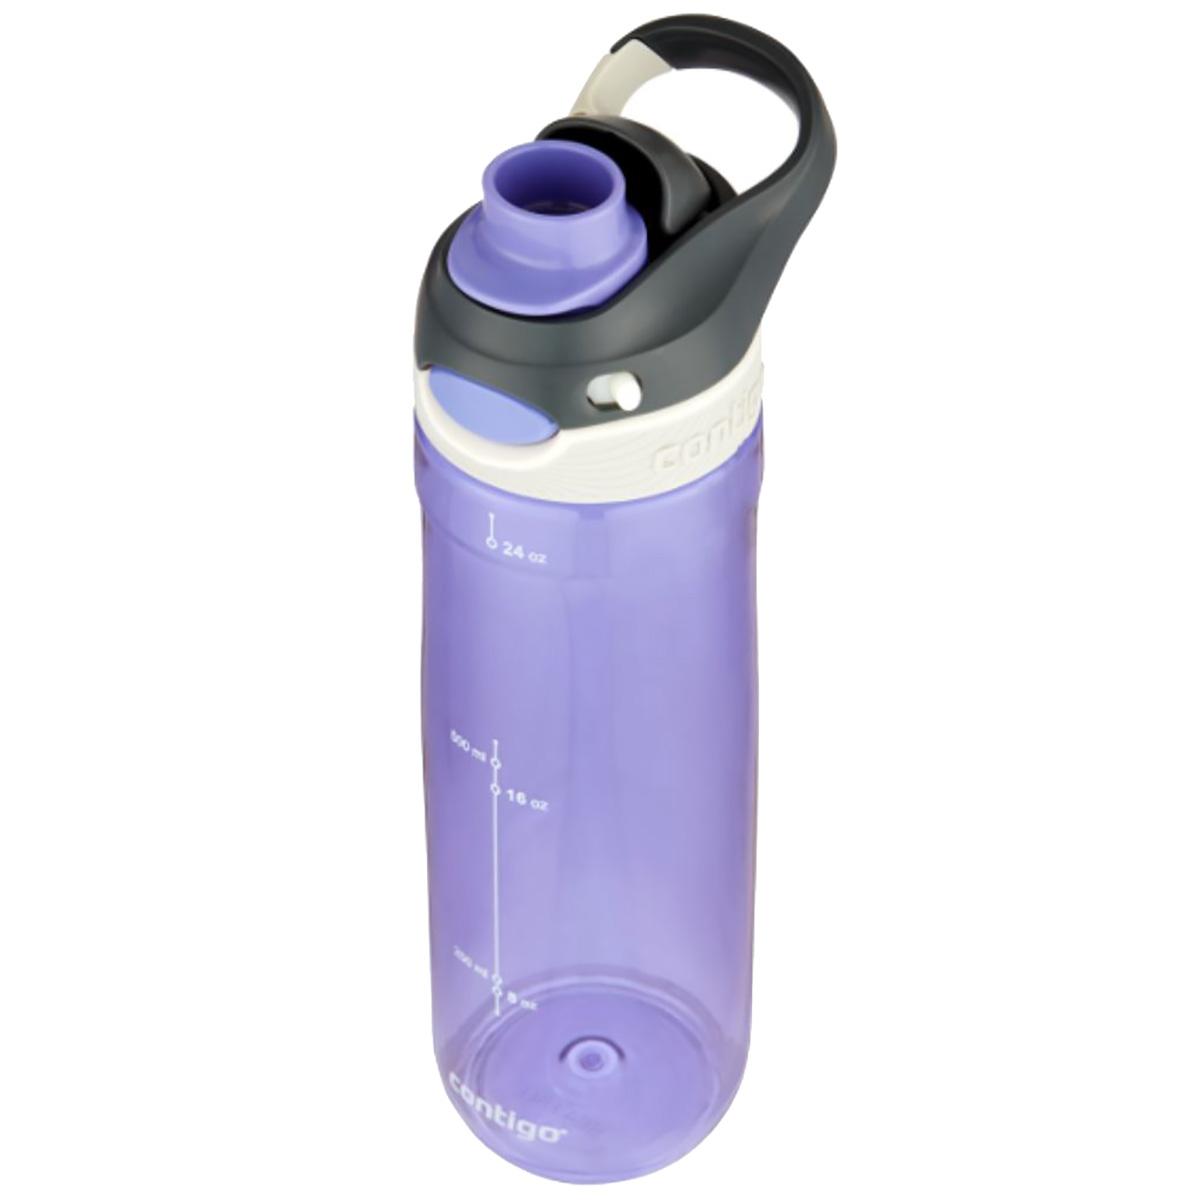 Contigo-24-oz-Chug-Autospout-Leak-Proof-Water-Bottle miniatuur 7